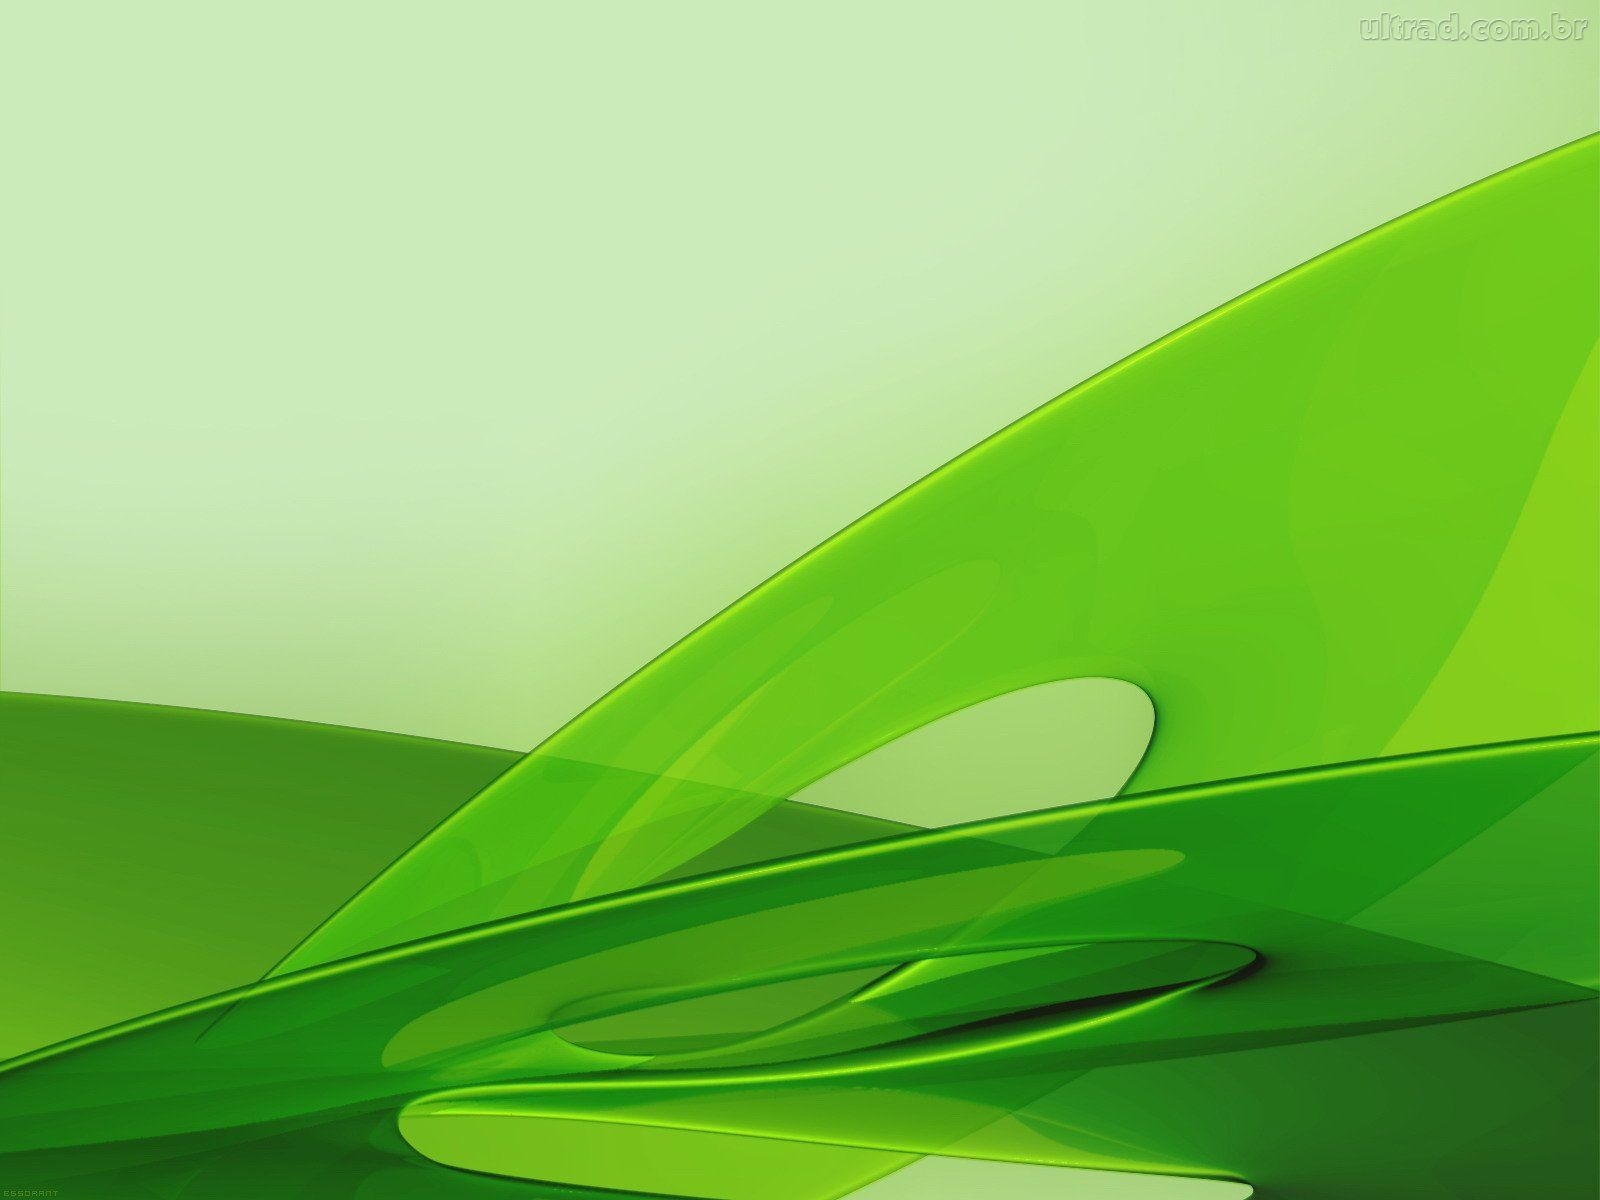 Imagensnet papel de parede verde - Papel pared ...